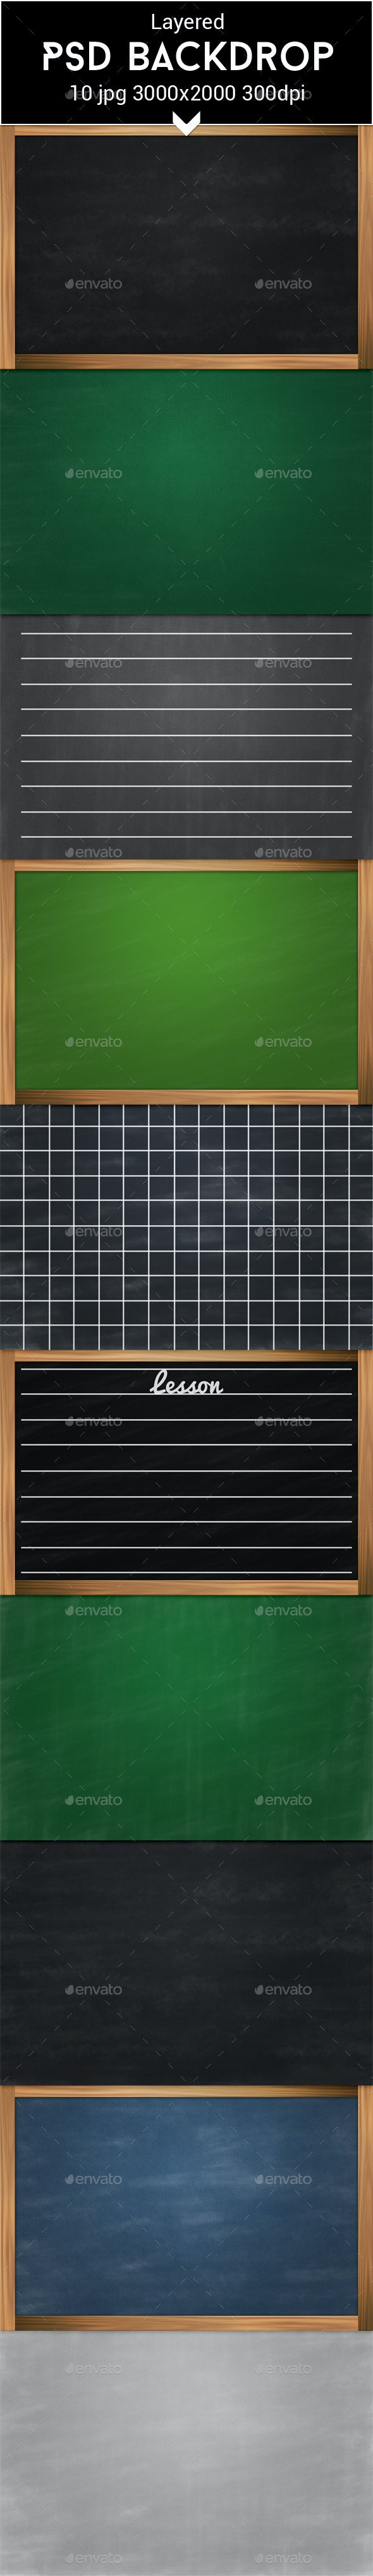 Chalkboard PSD Backdrop - Education Backgrounds